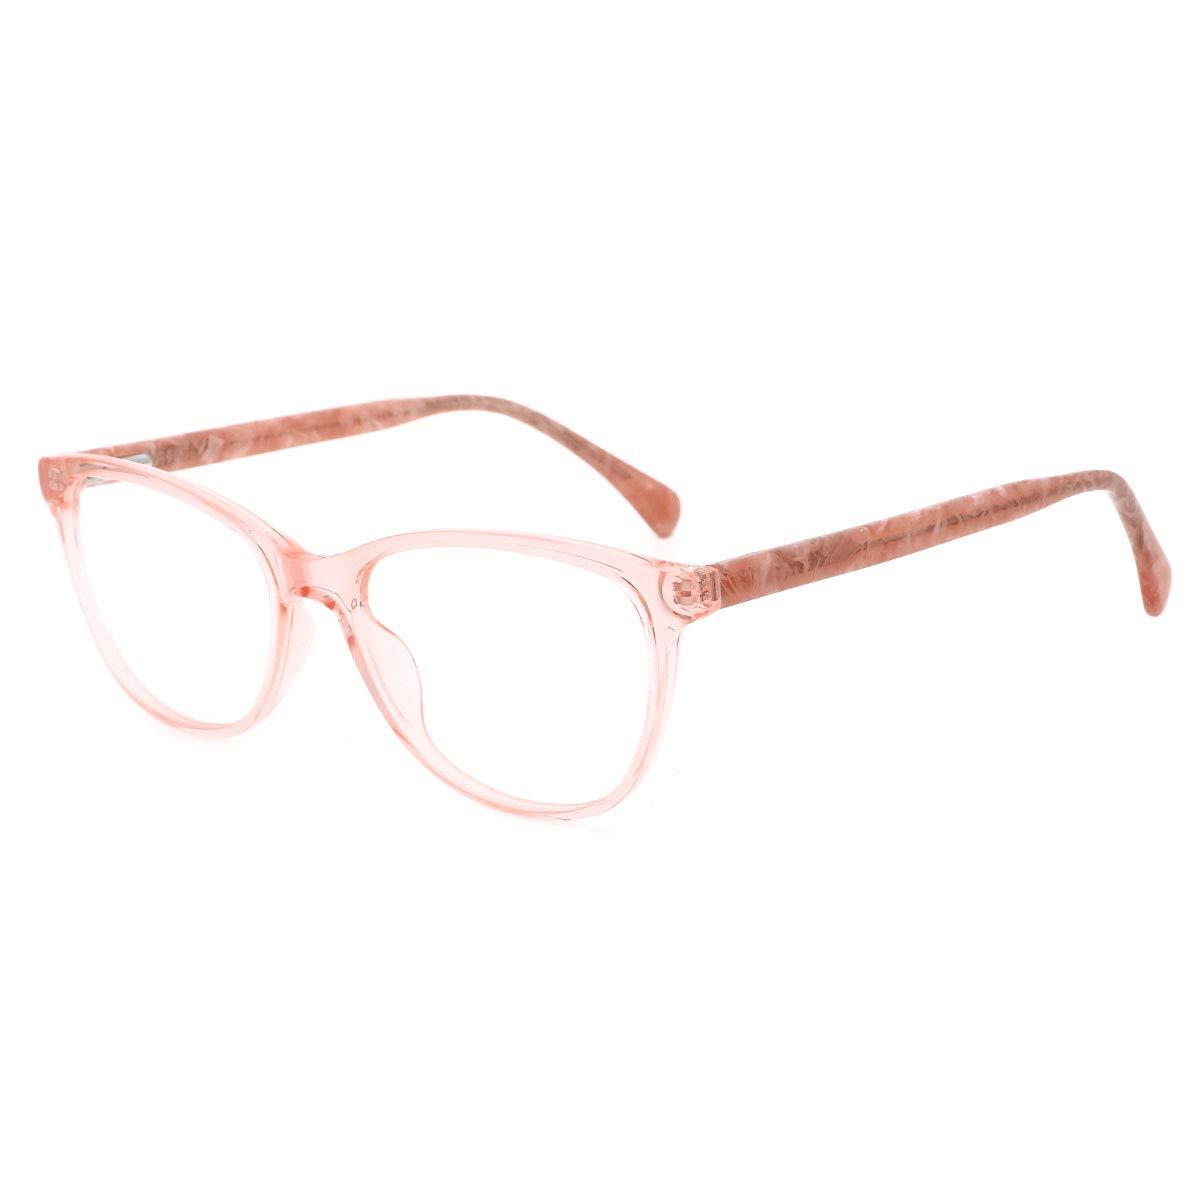 O-Q CLUB Anti Blue Light Computer Glasses Stylish Spring Hinge Video Gaming Glasses Reduce Eye Fatigue